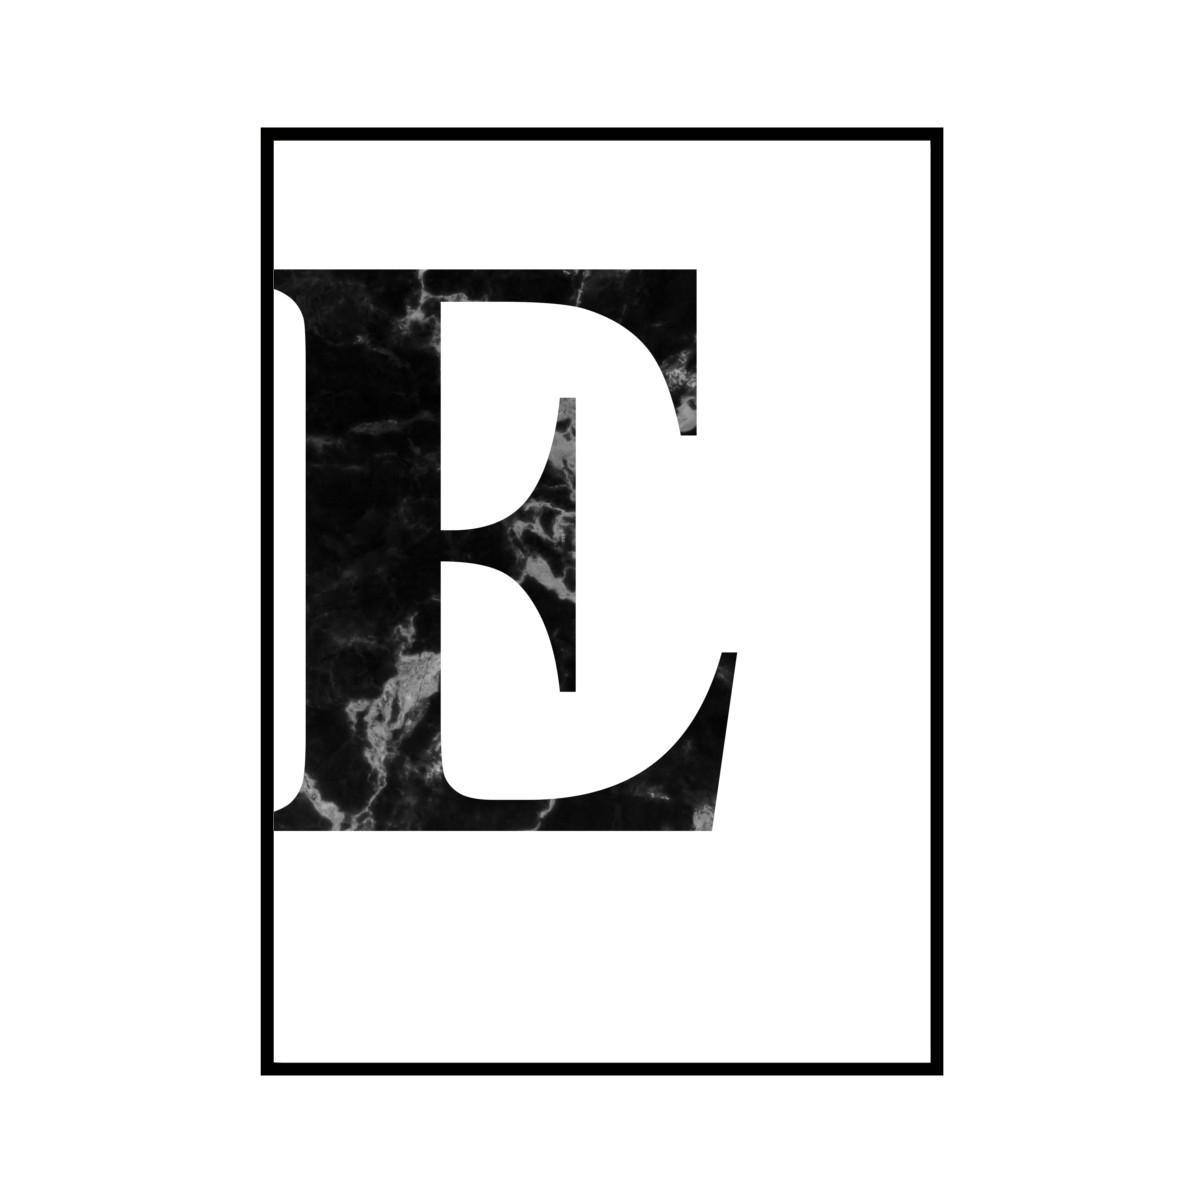 """E"" 黒大理石 - Black marble - ALPHAシリーズ [SD-000506] B4サイズ ポスター単品"